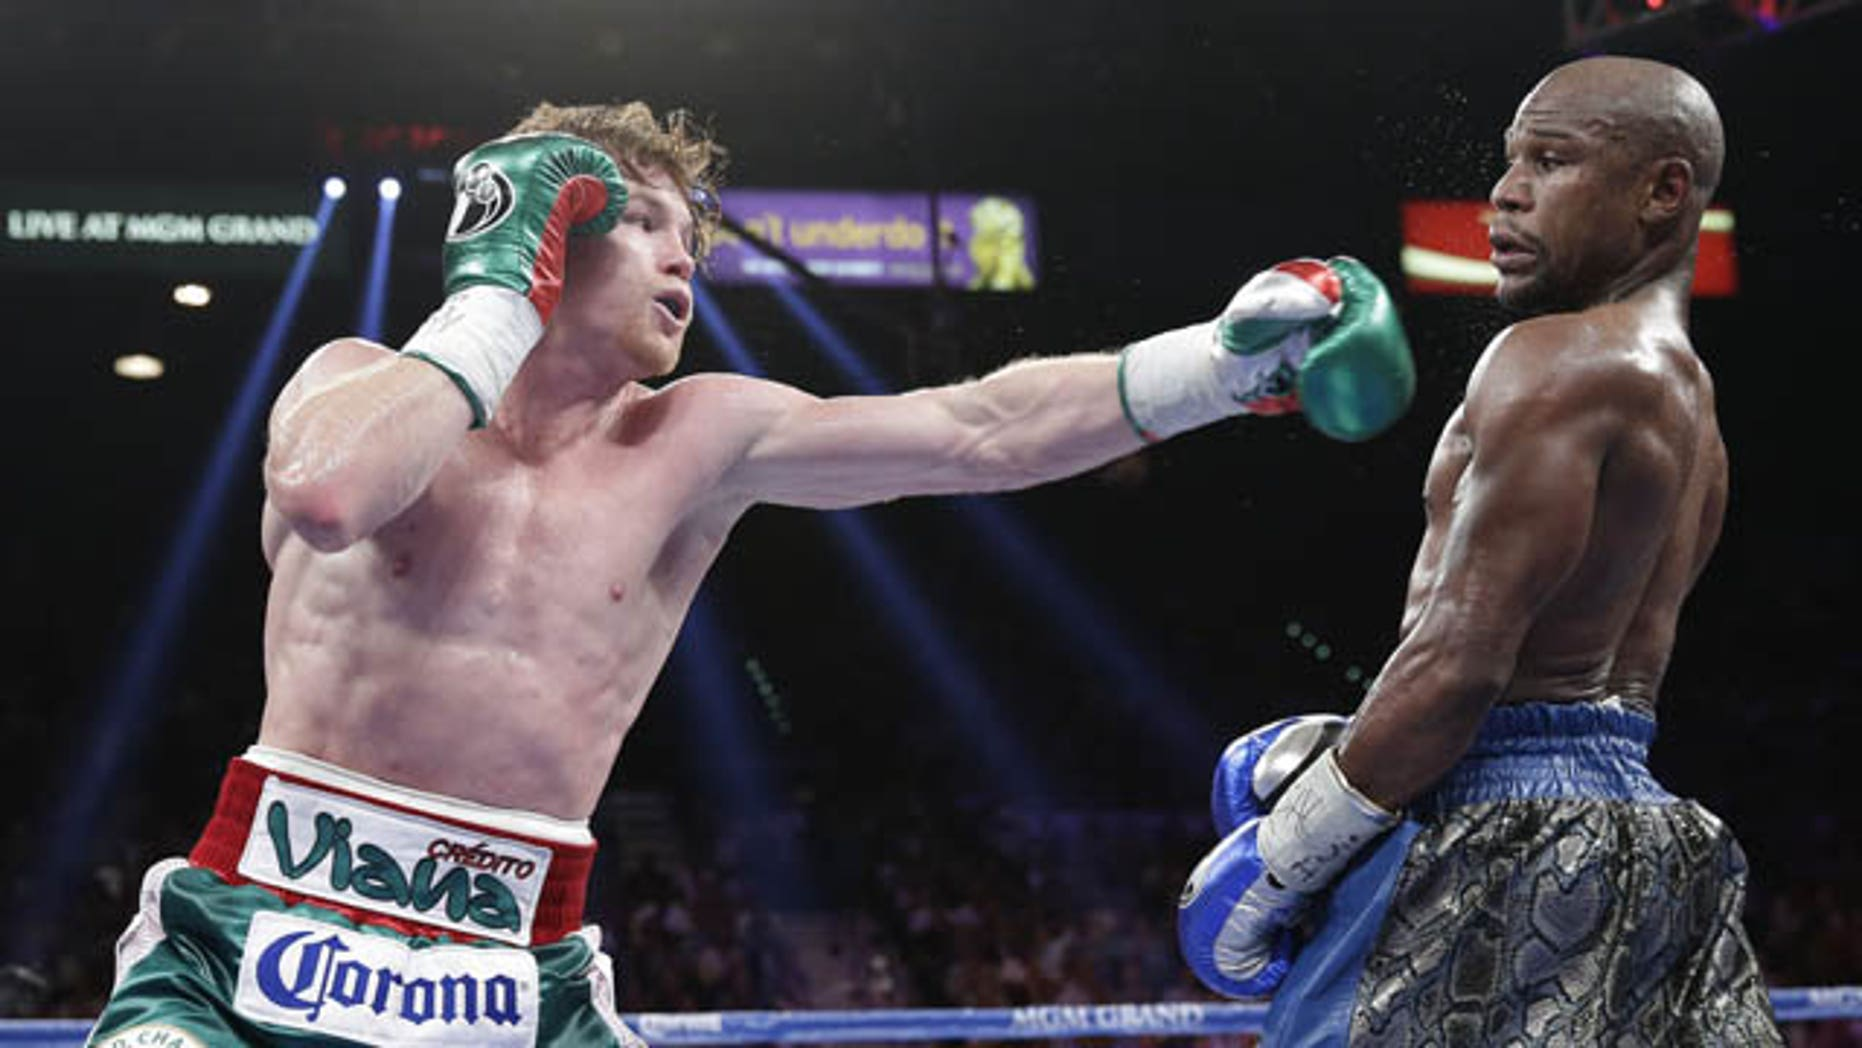 September 14, 2013: Canelo Alvarez throws a jab at Floyd Mayweather Jr. during a 152-pound title fight in Las Vegas. (AP Photo)